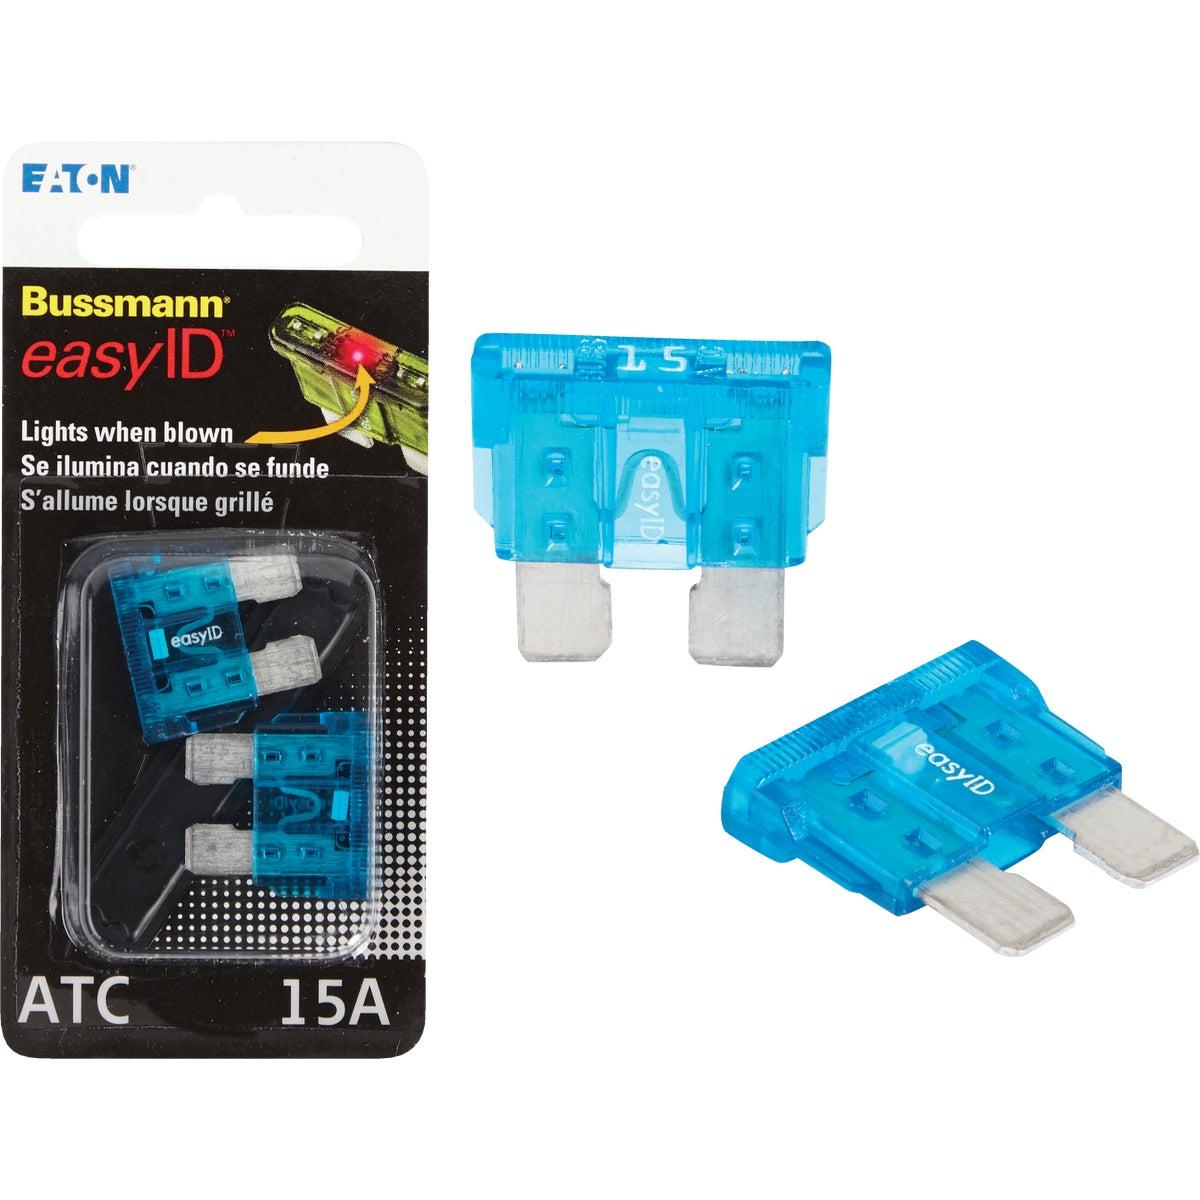 2PK 15A ATC EASY ID FUSE